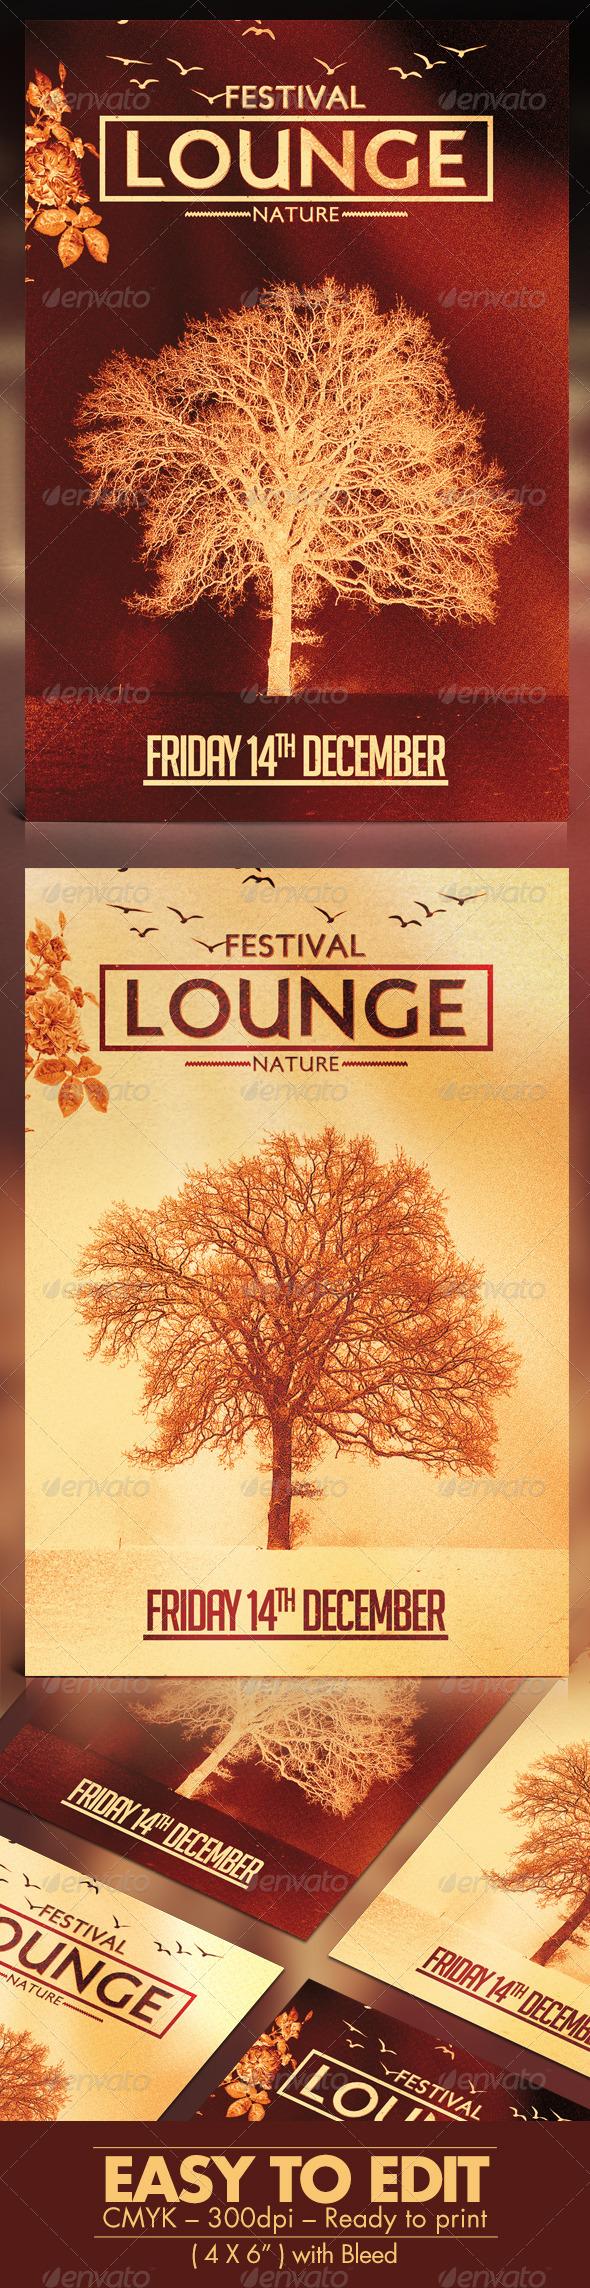 Festival Lounge Flyer